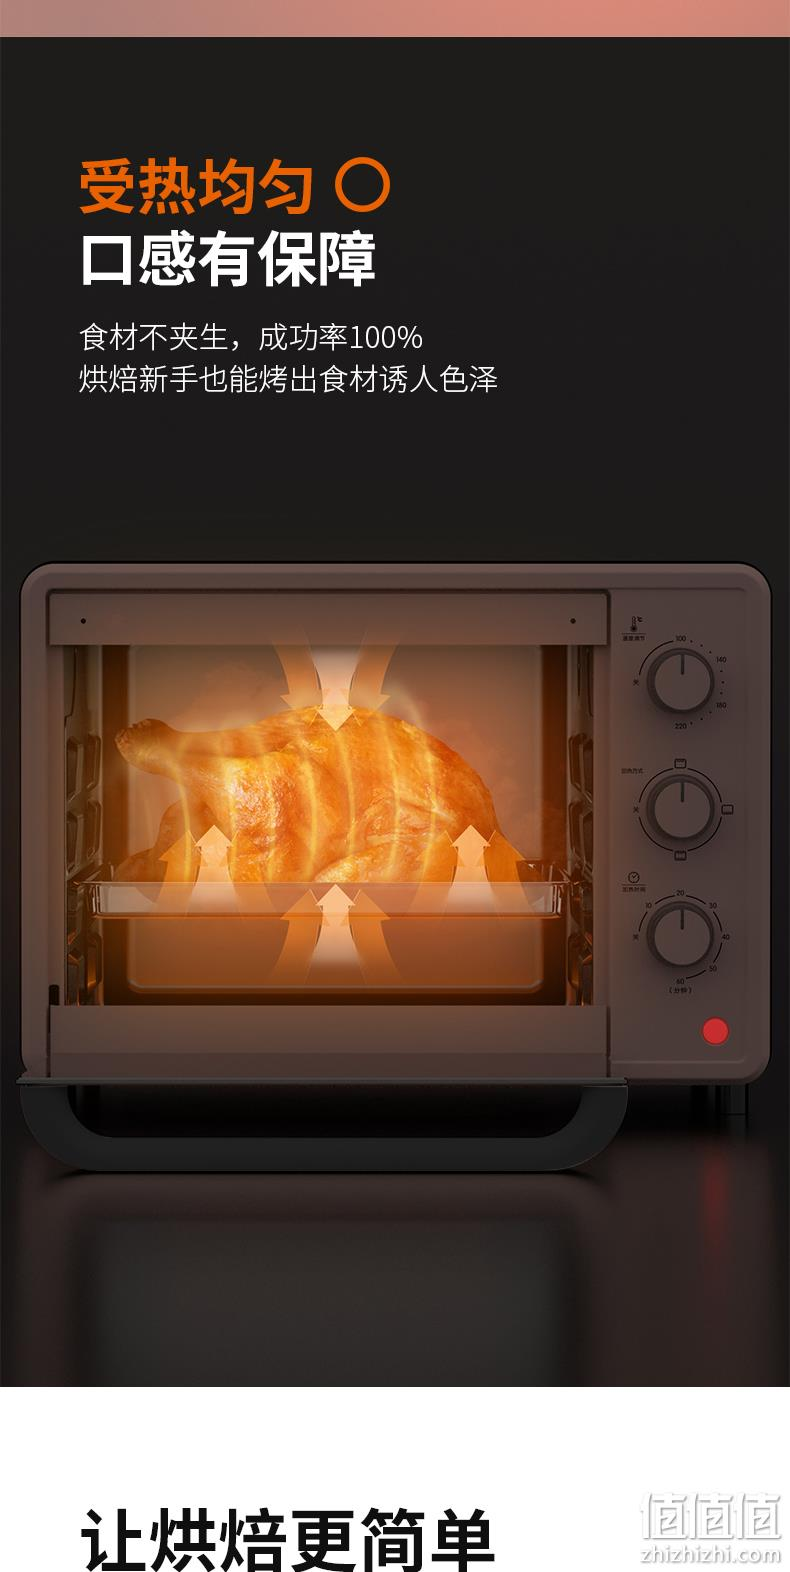 32L大容量、高颜值北欧风:九阳 多功能烤箱KX32-V171 券后189元包邮  值值值-买手聚集的地方